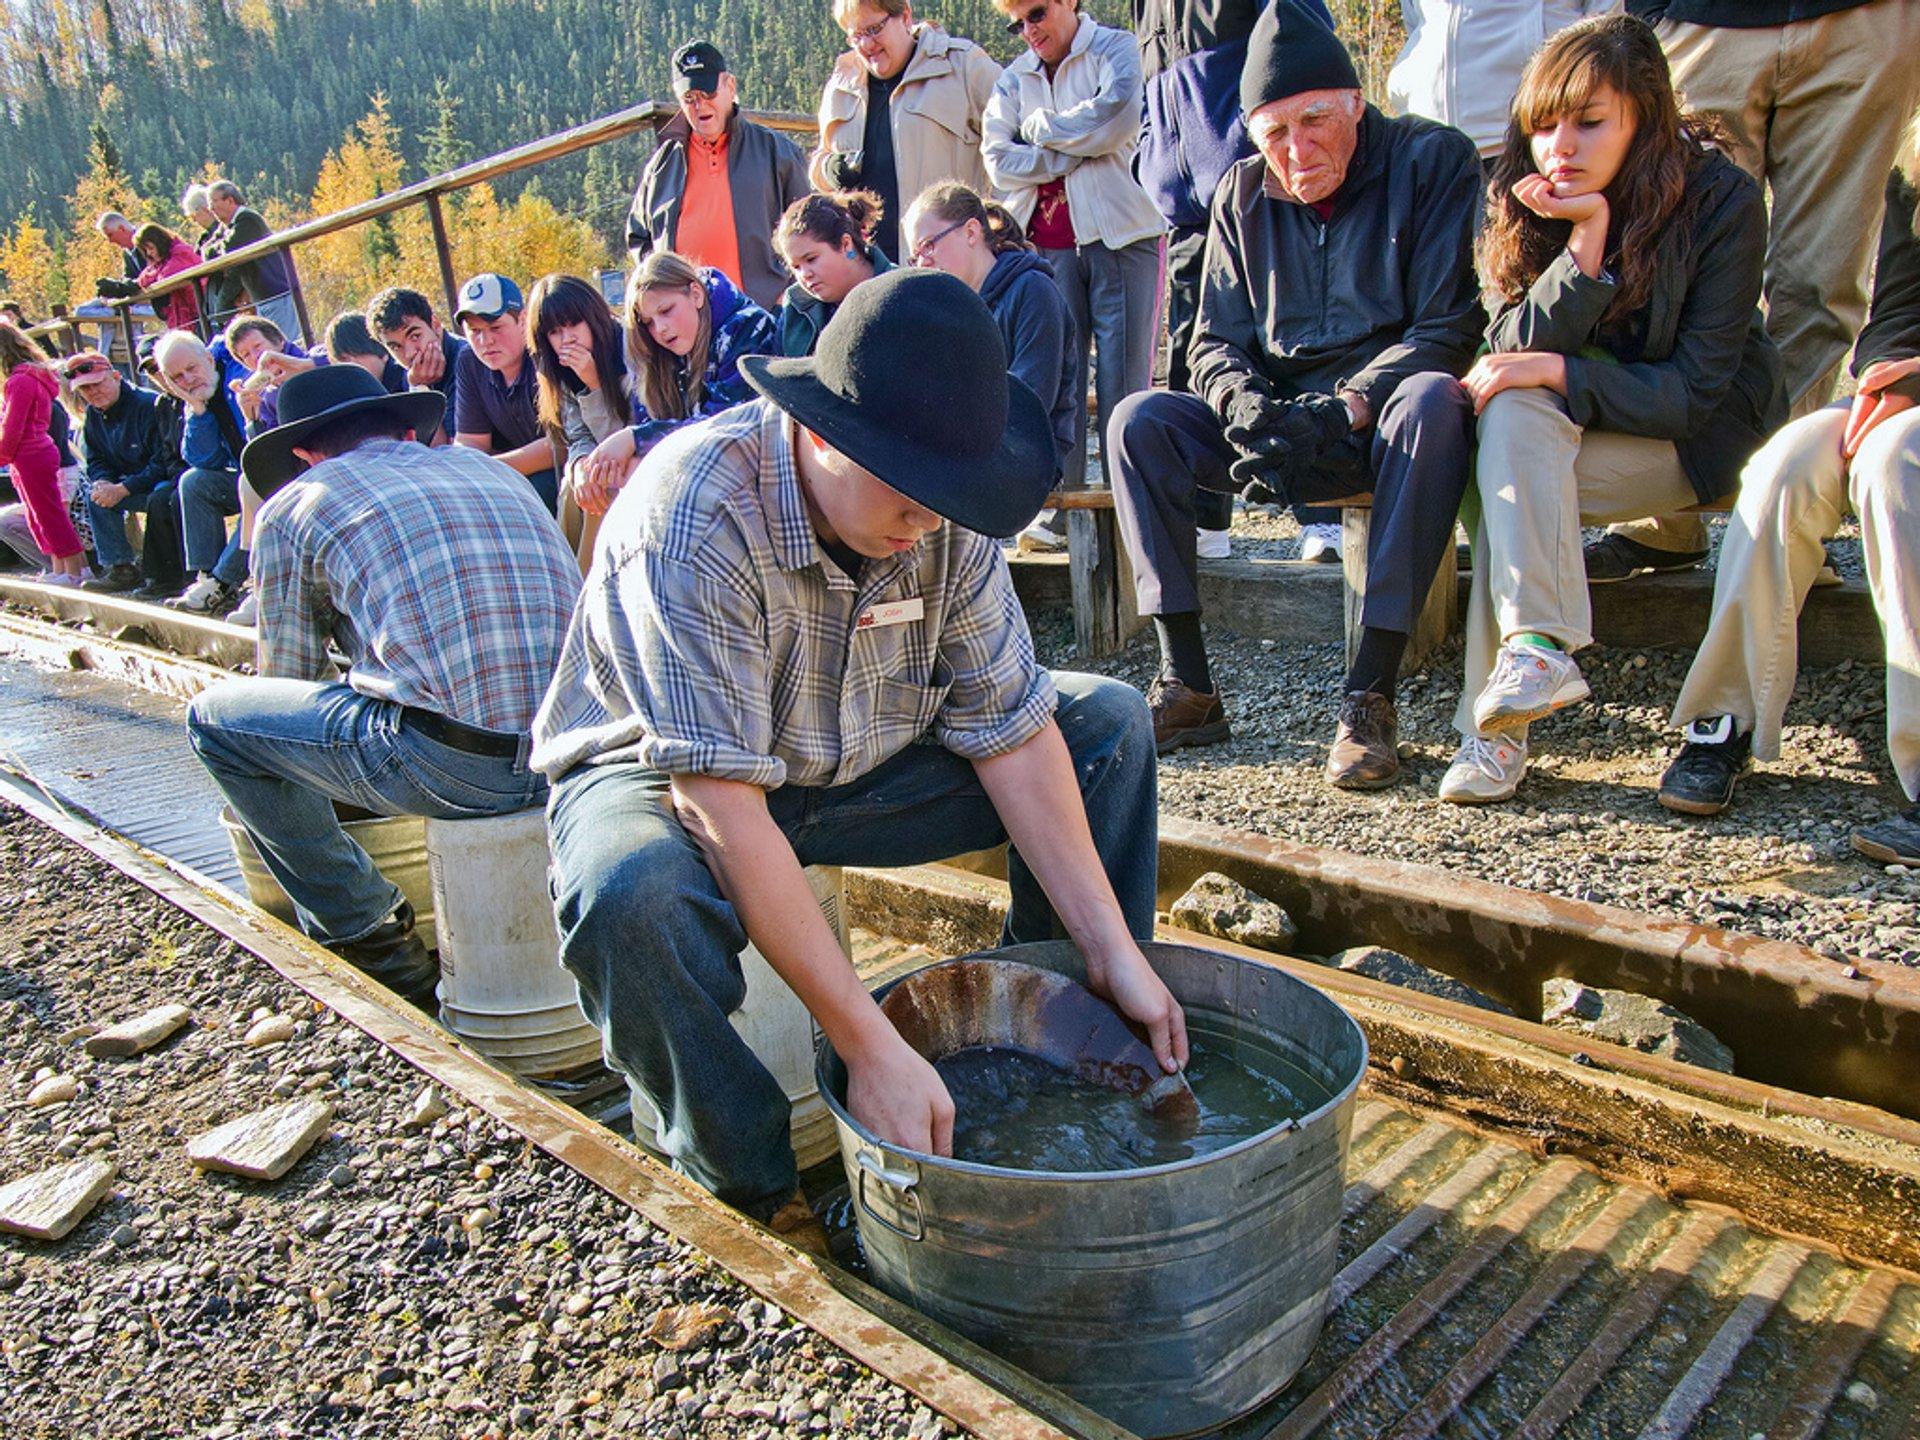 Panning for Gold at Eldorado Gold Mine 2019